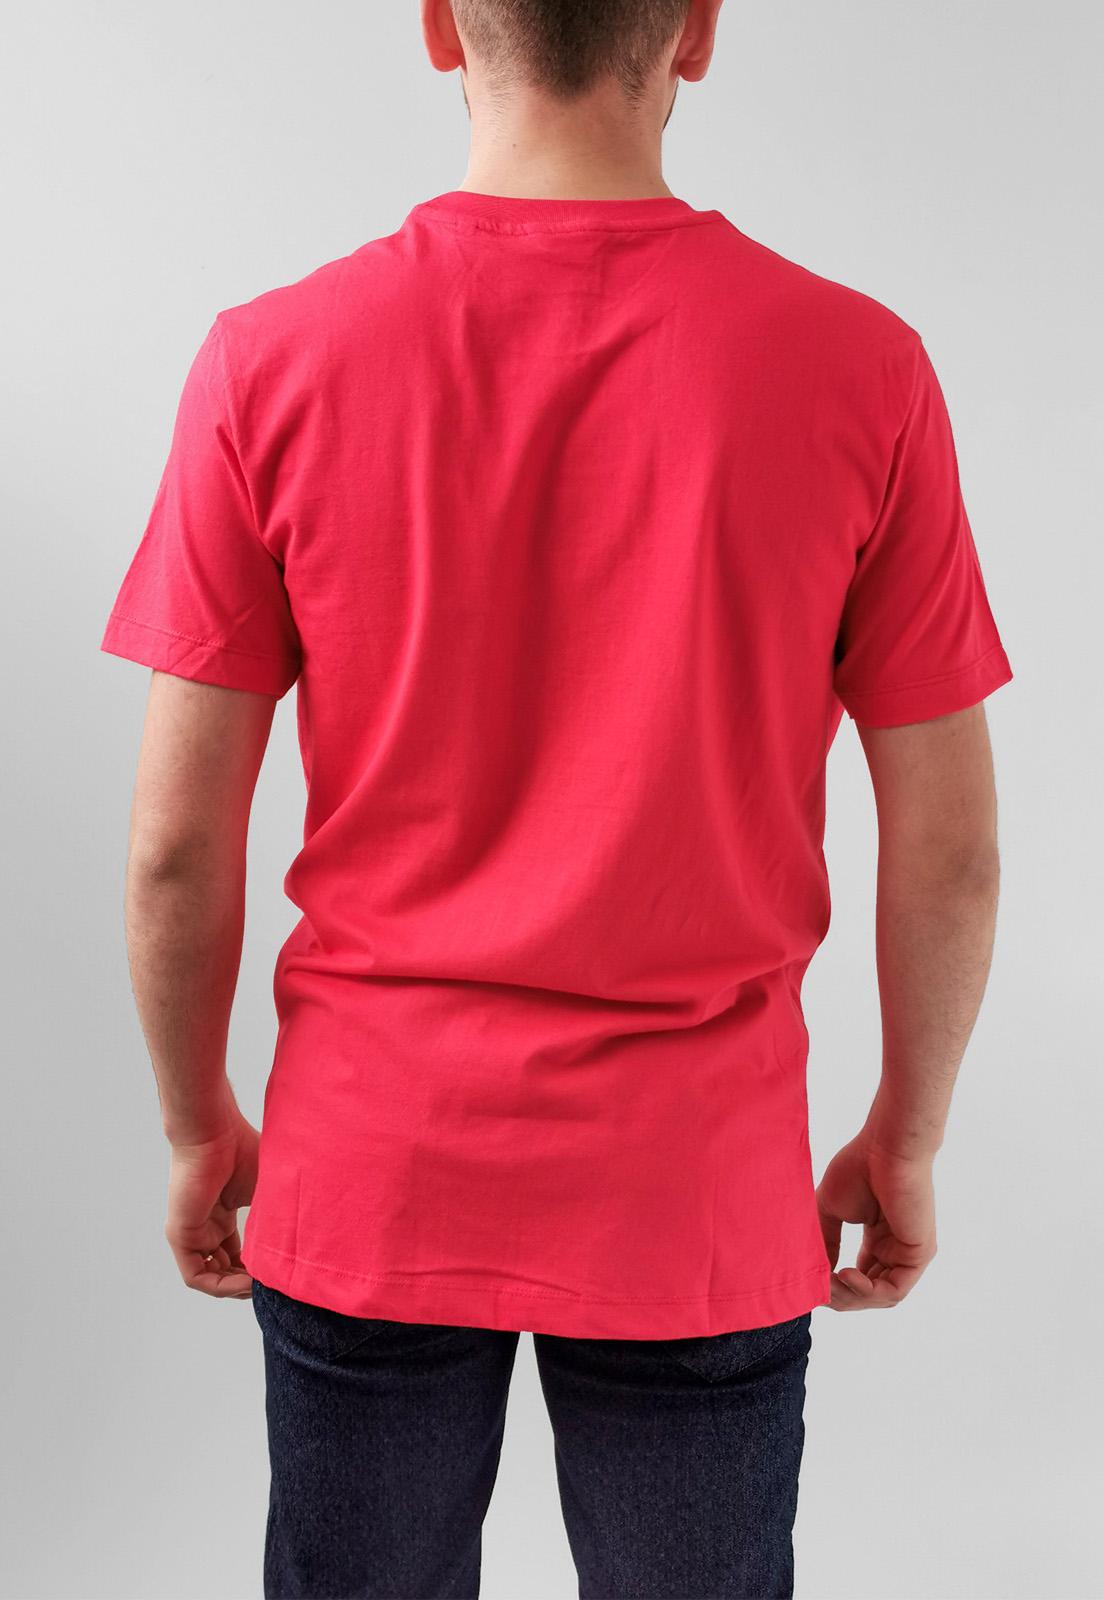 Camiseta Calvin Klein Vernelho Logo Relevo